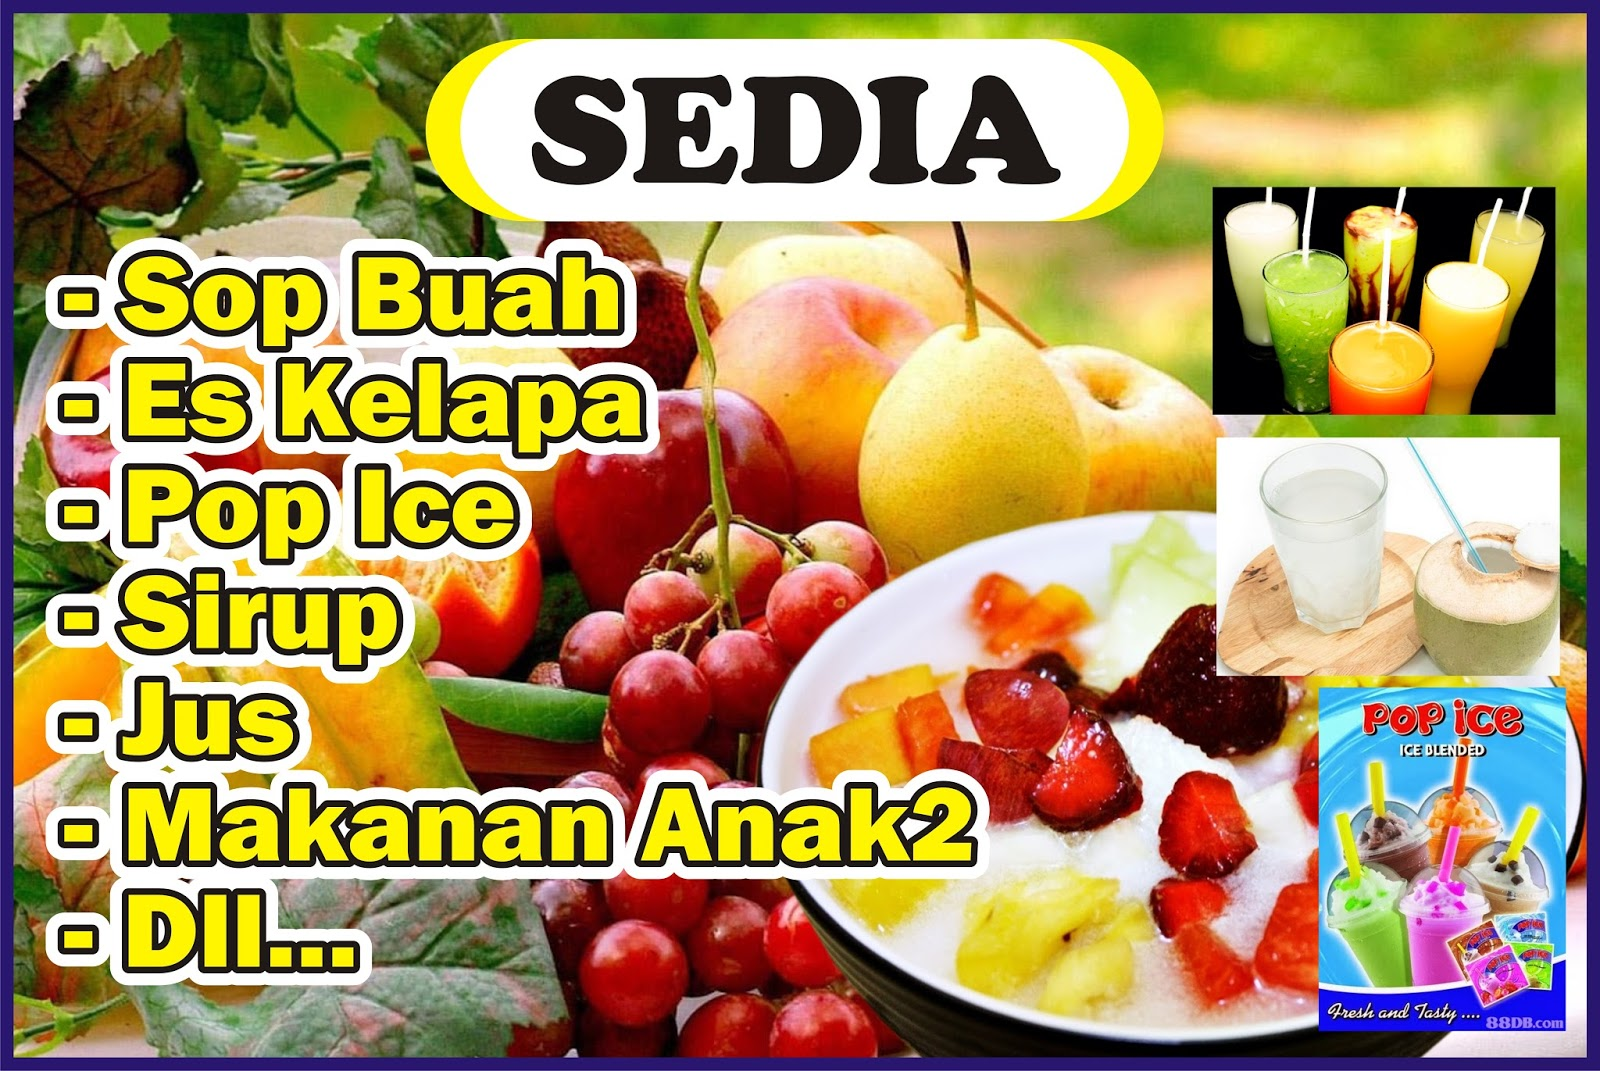 Download Kumpulan Contoh Desain Spanduk Aneka Minuman.cdr ...